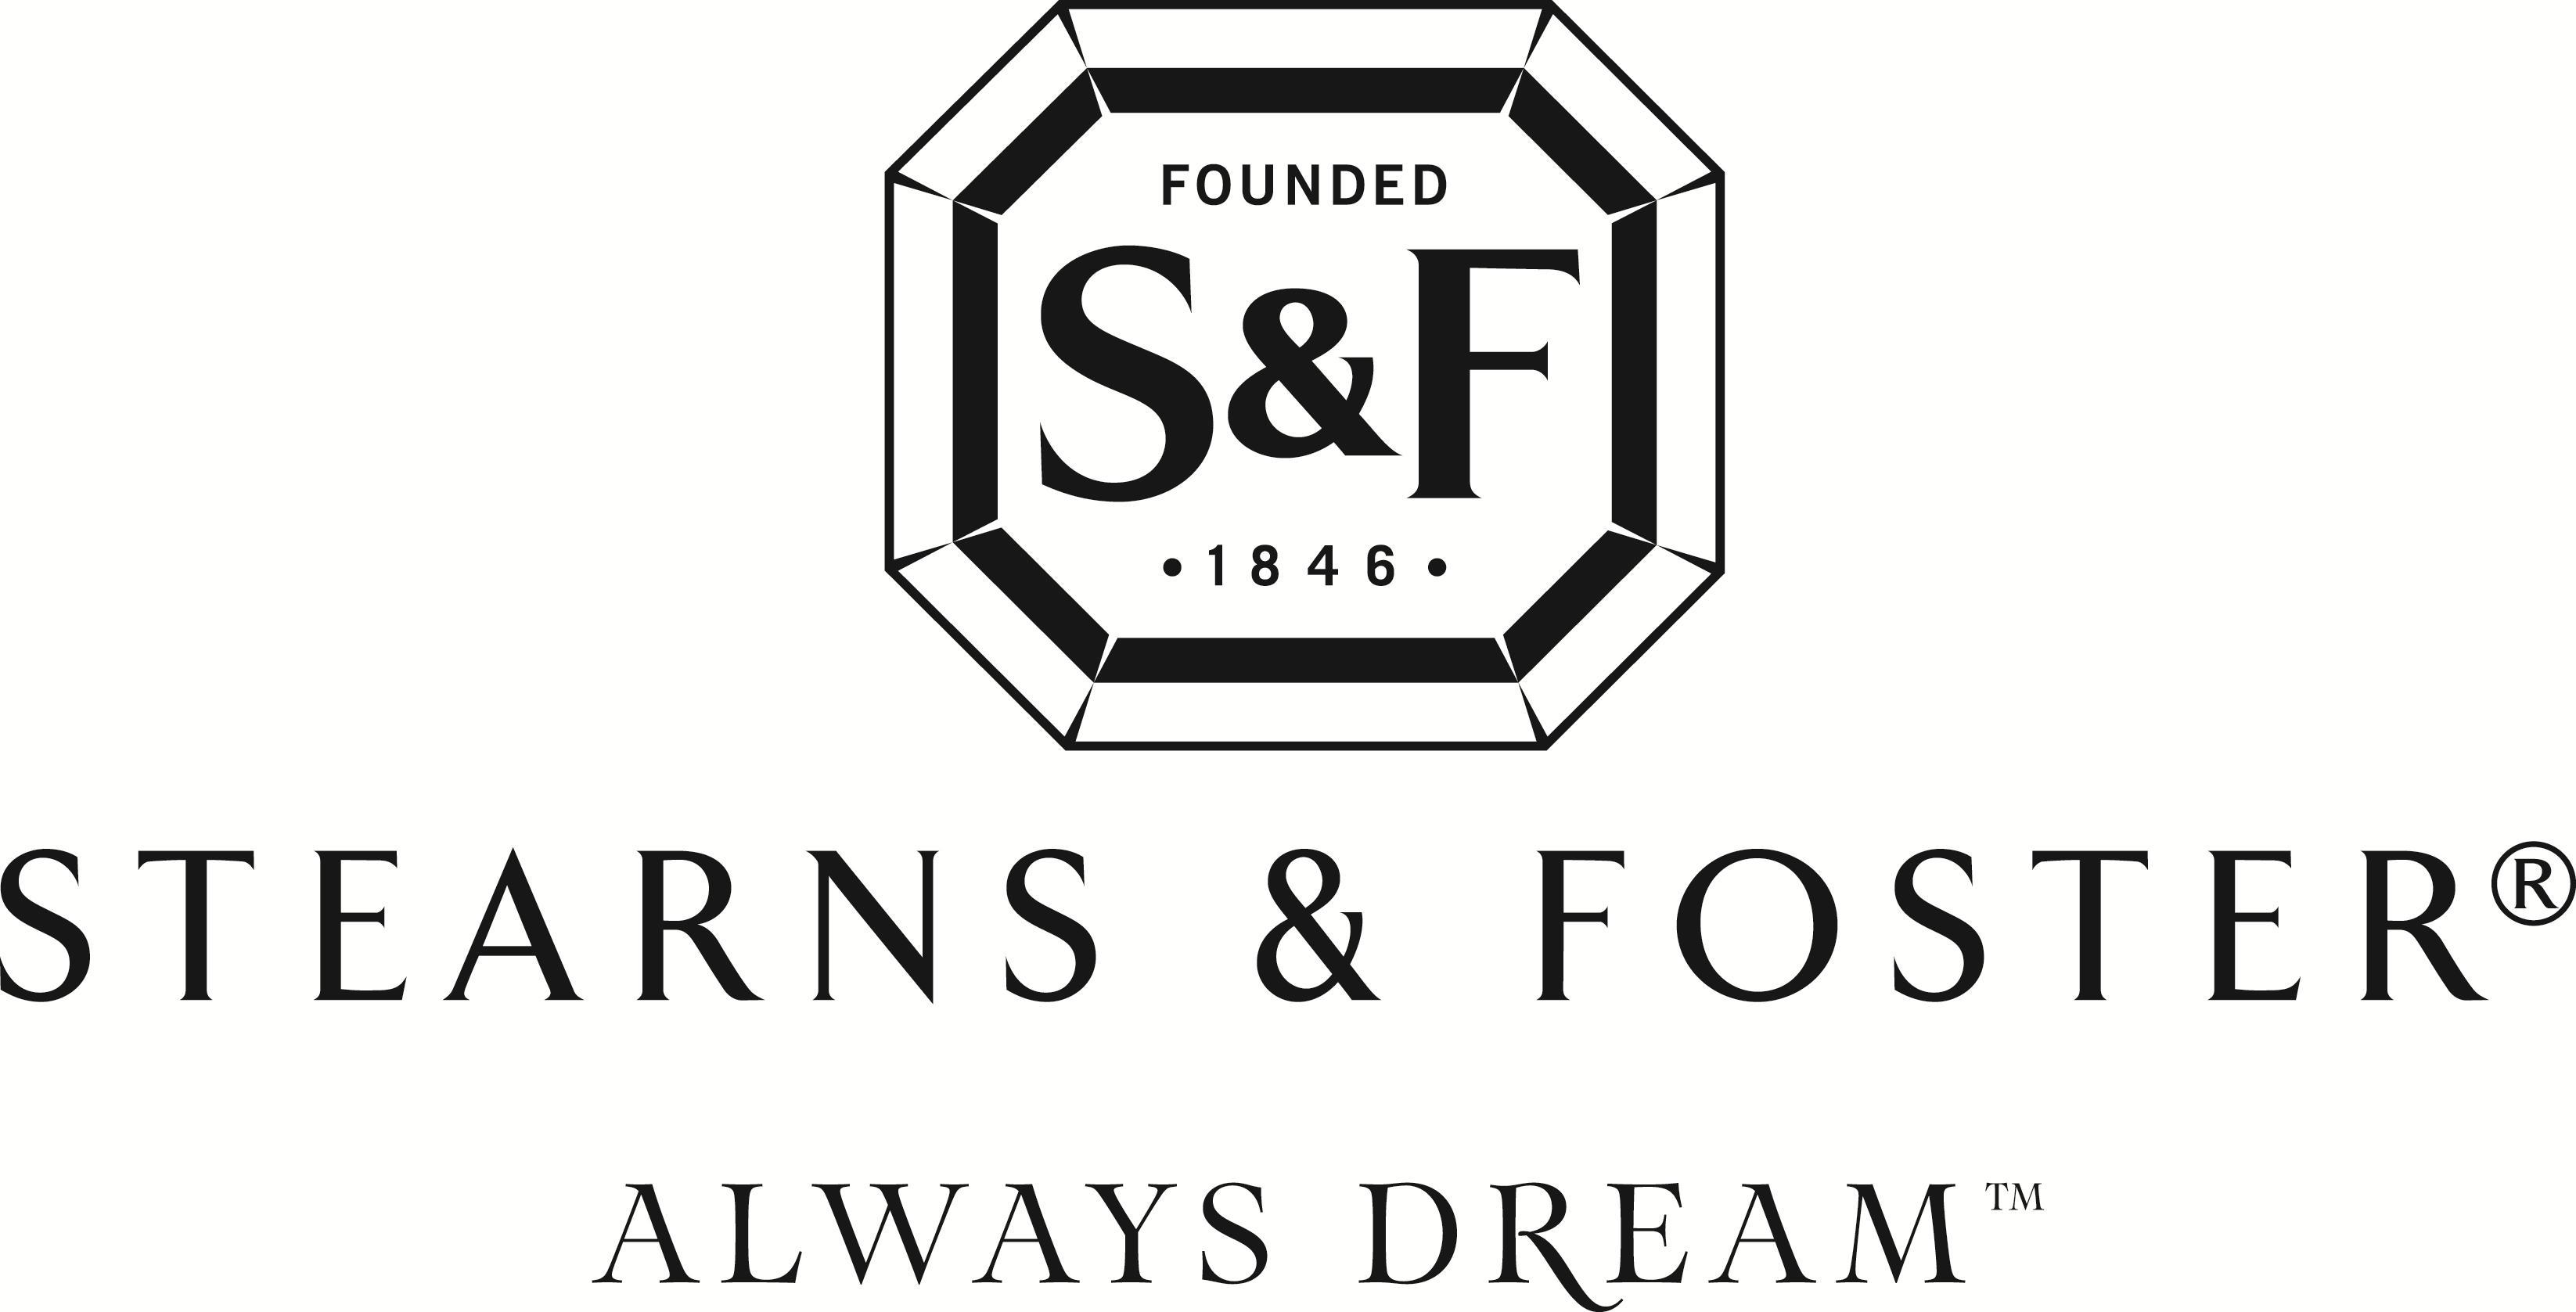 Stearns & Foster Middlewich King Luxury Plush Mattress - Rotmans - Mattress  Worcester, Boston, MA, Providence, RI, and New England